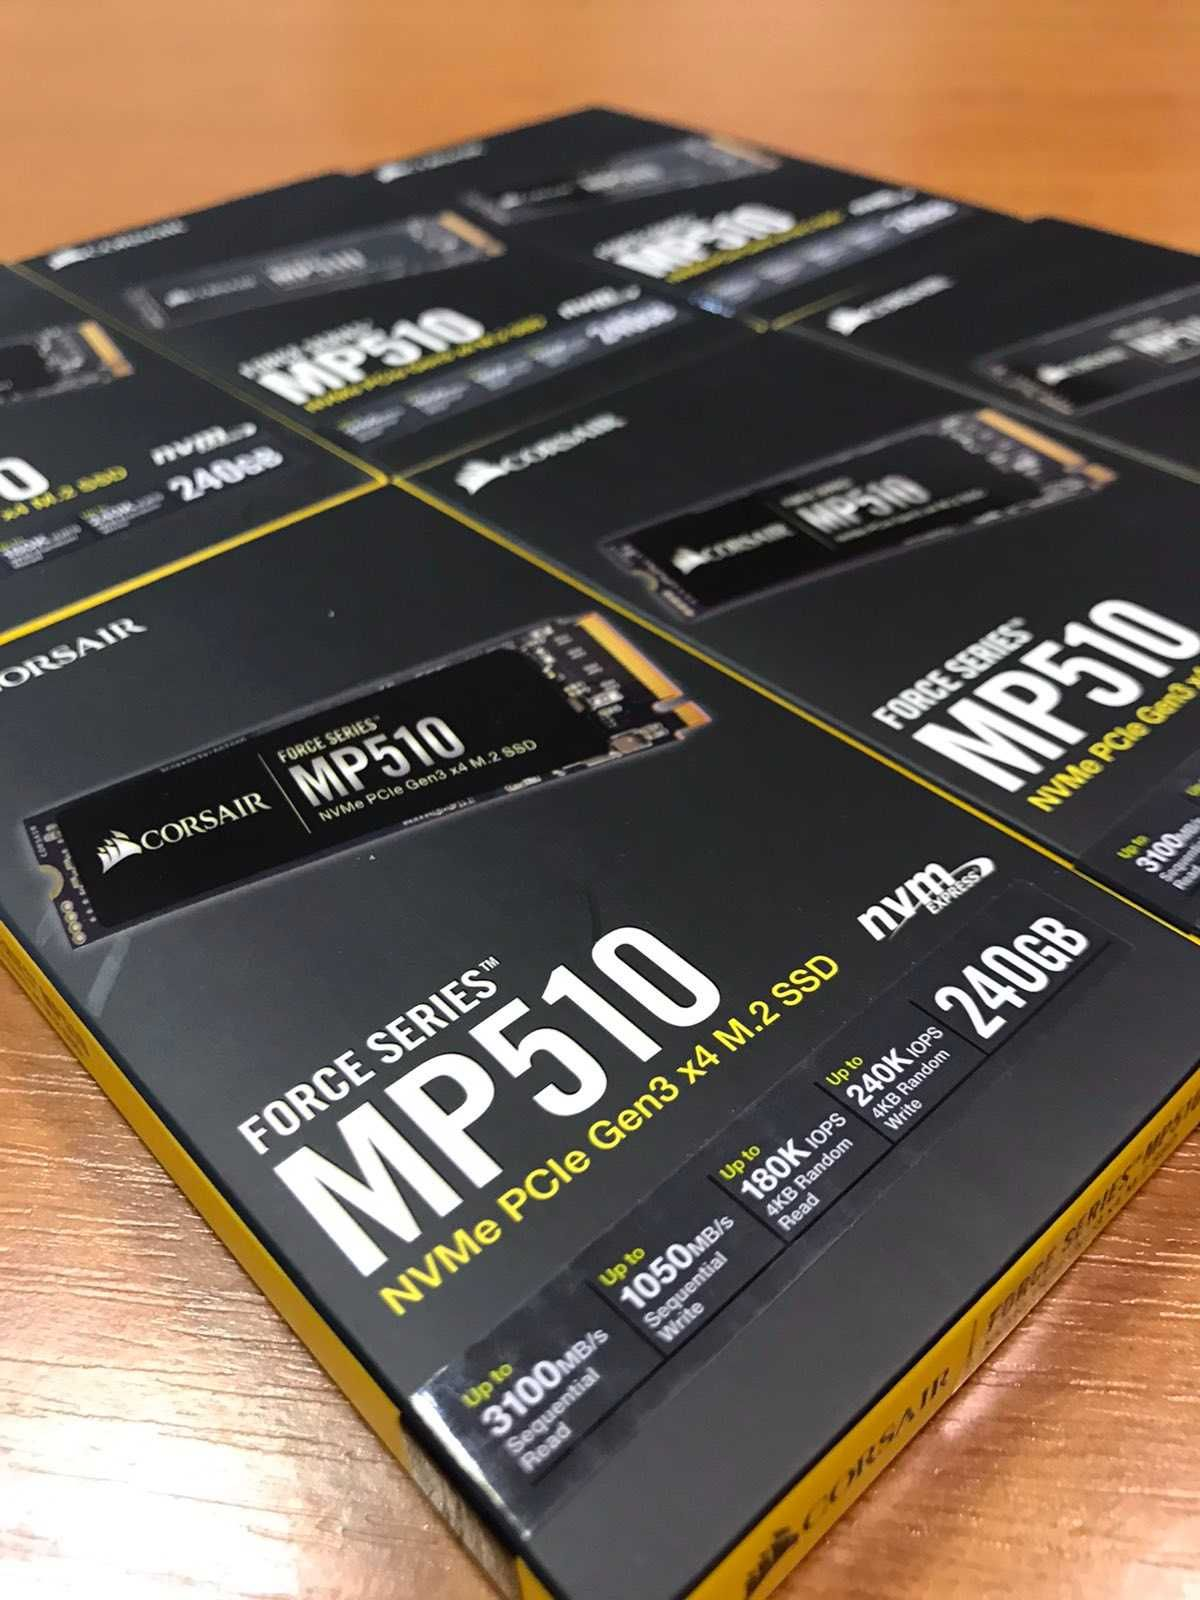 SSD Corsair Force Series MP510 240GB NVMe M.2 2280 PCIe 3.0